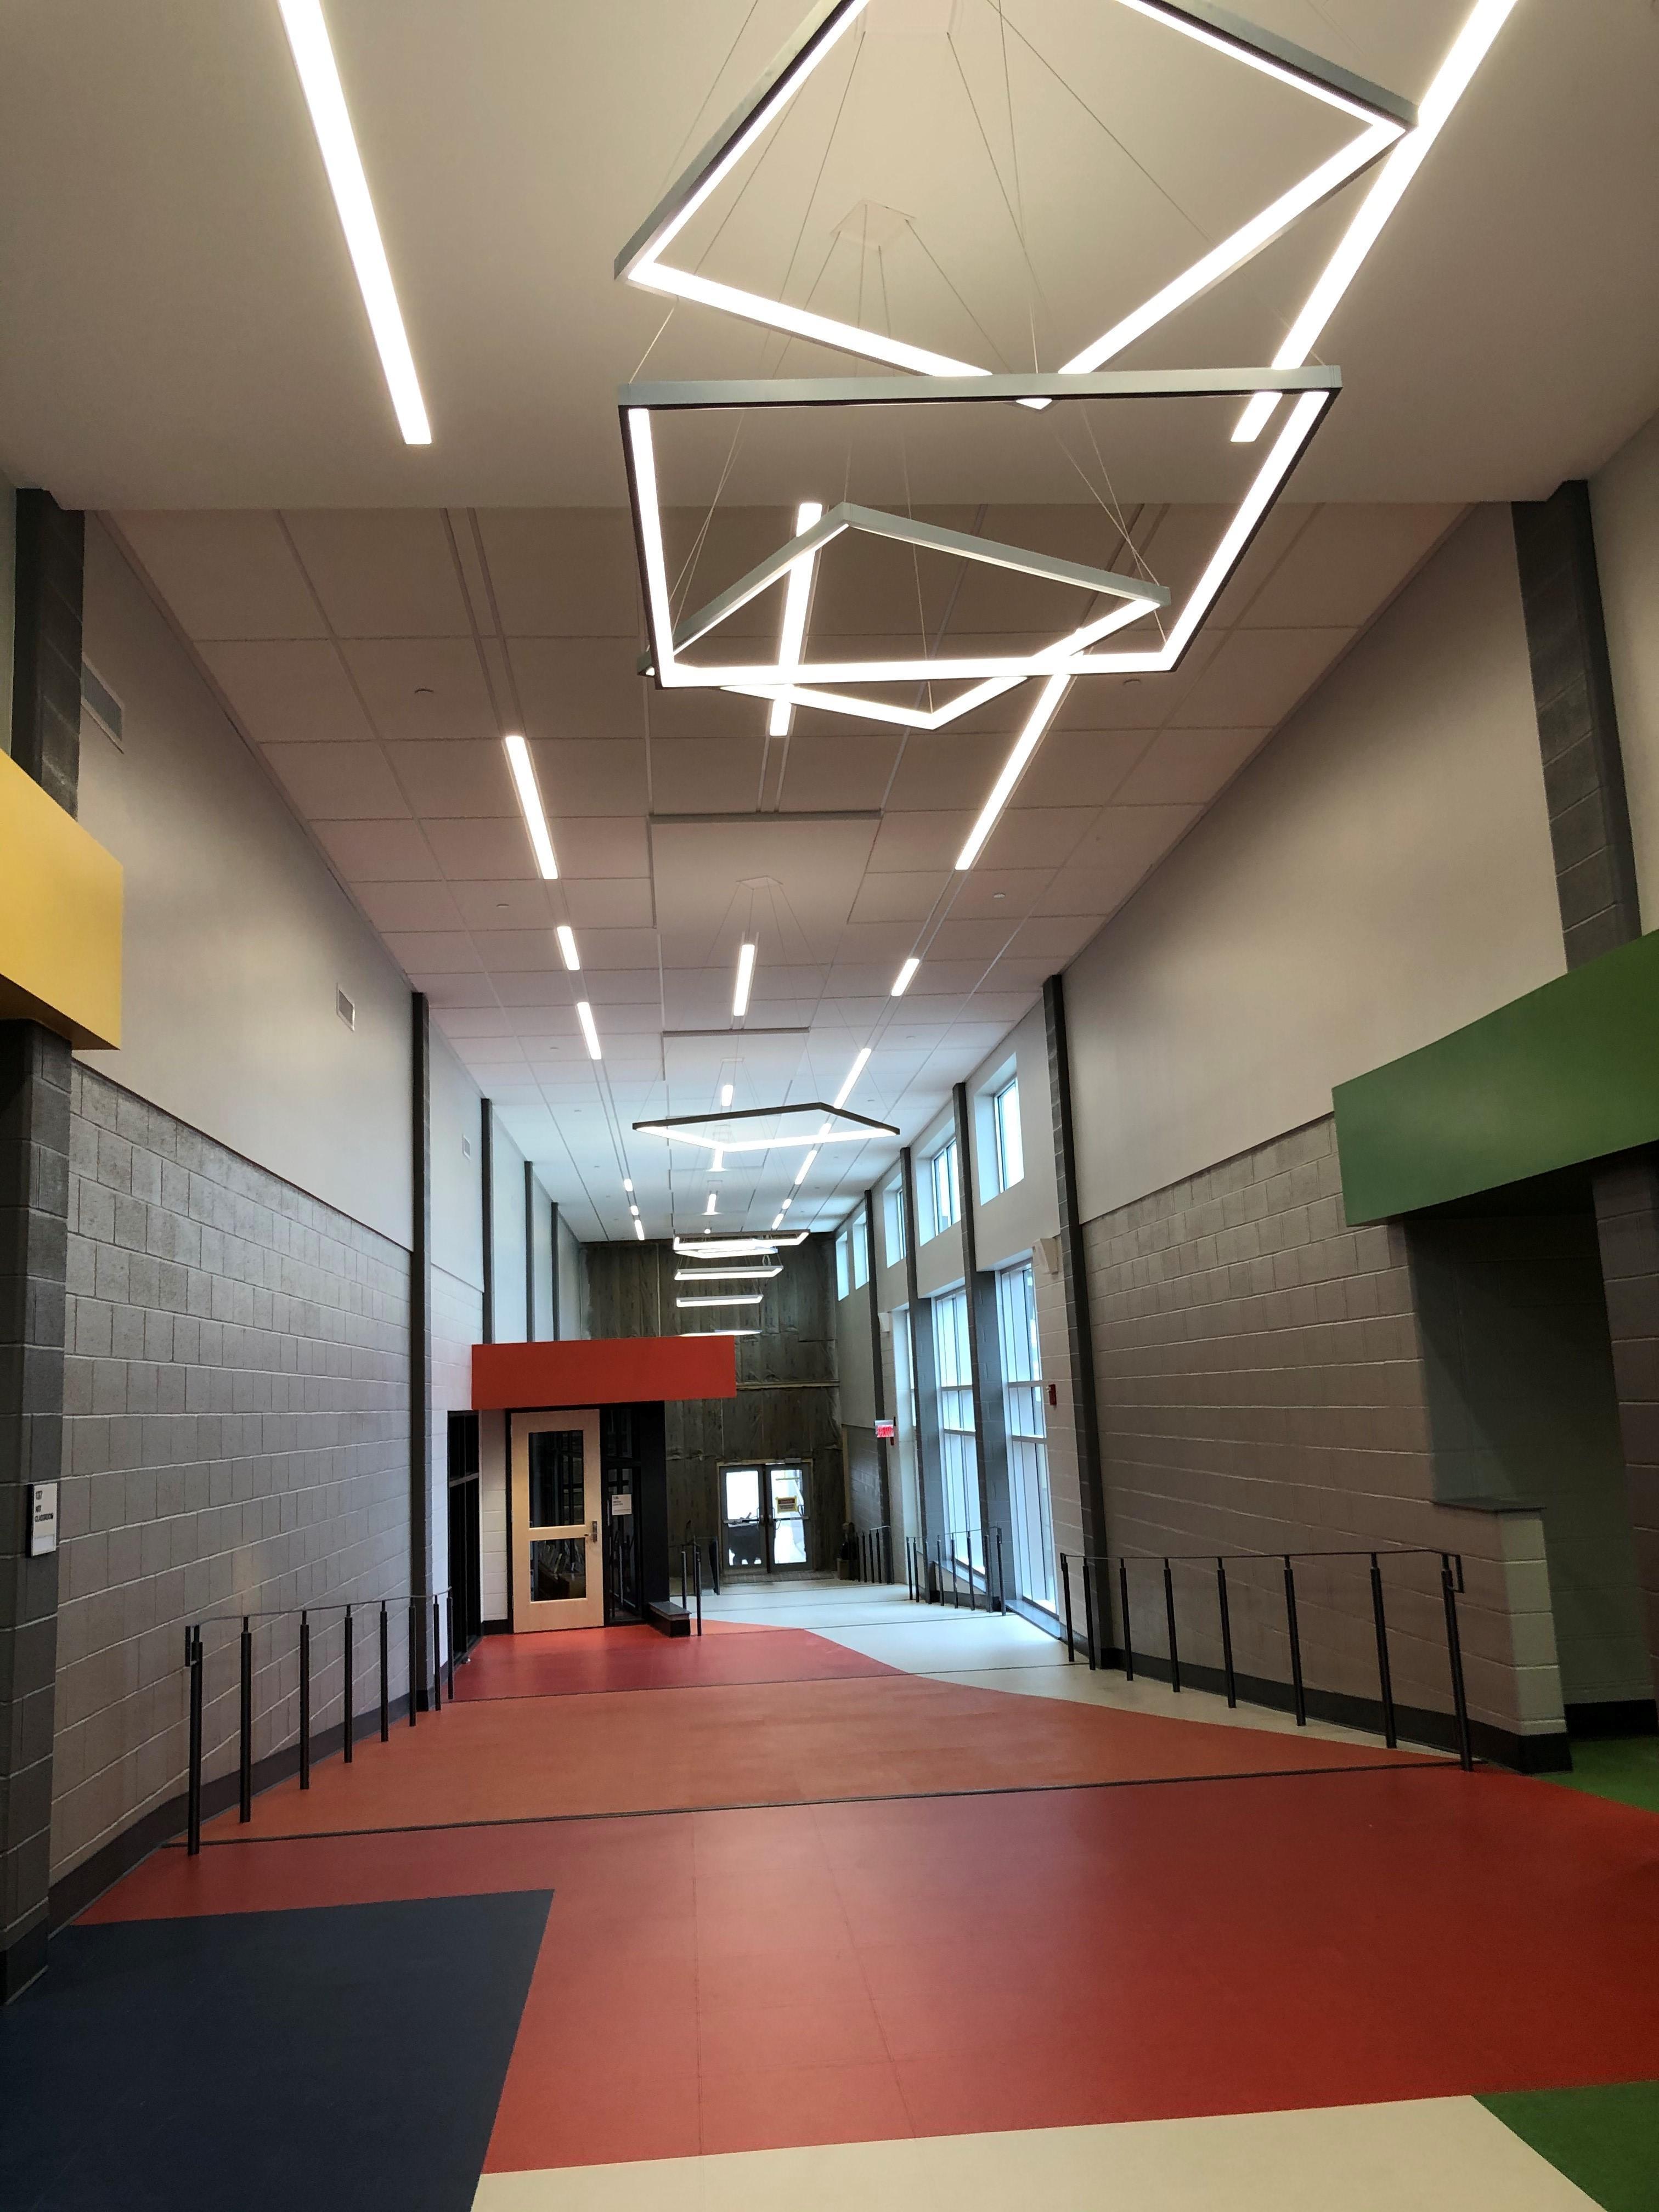 Hallway in New Wing between New/Old Building